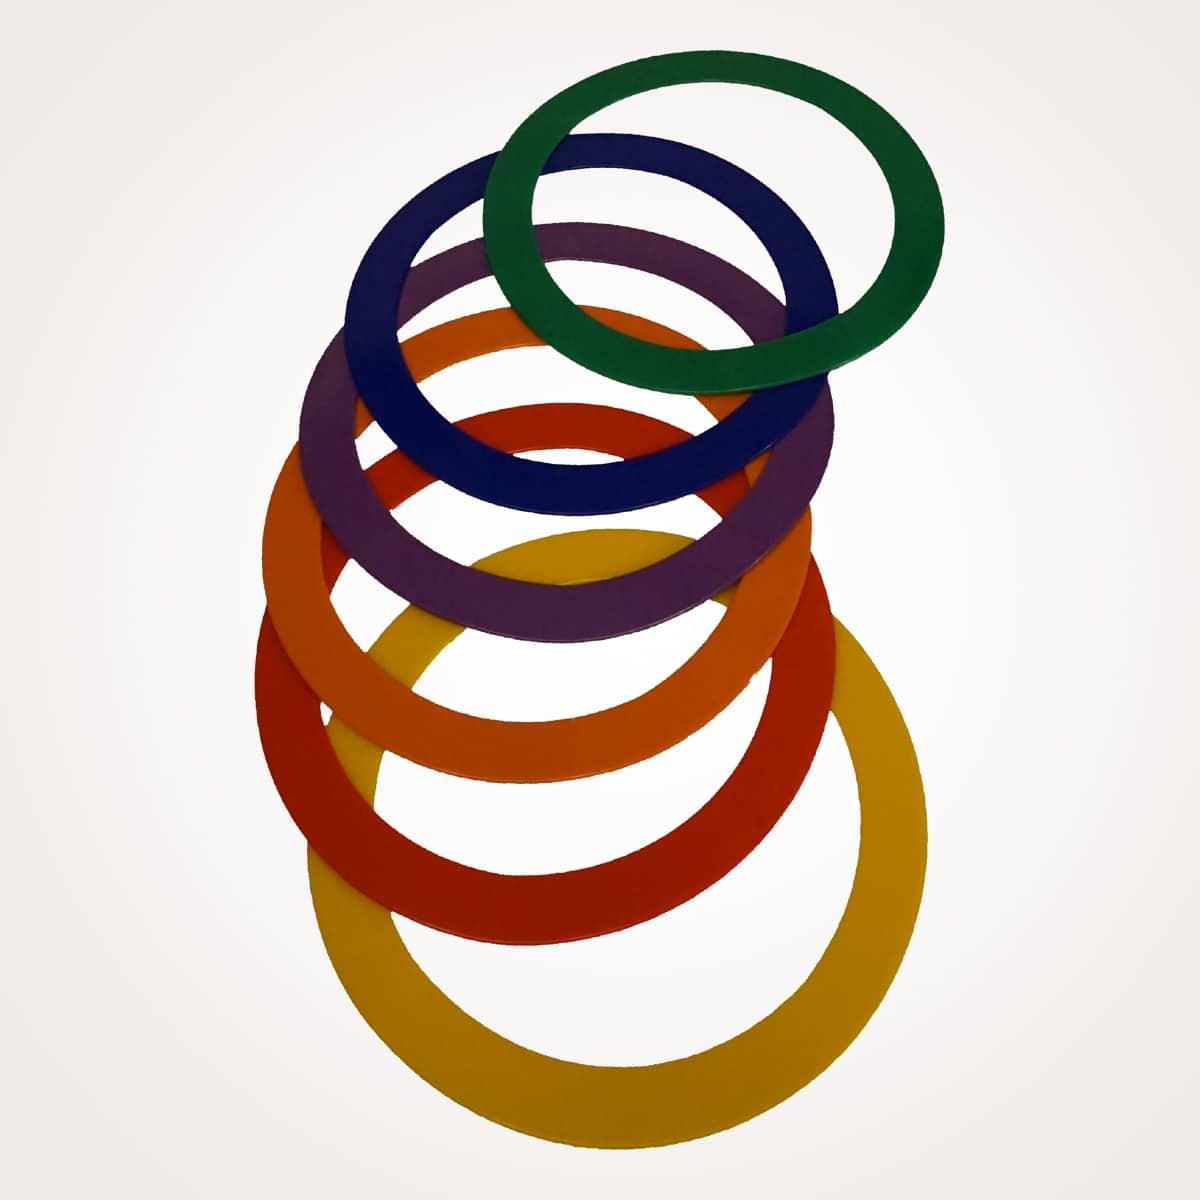 anneau de marquage au sol